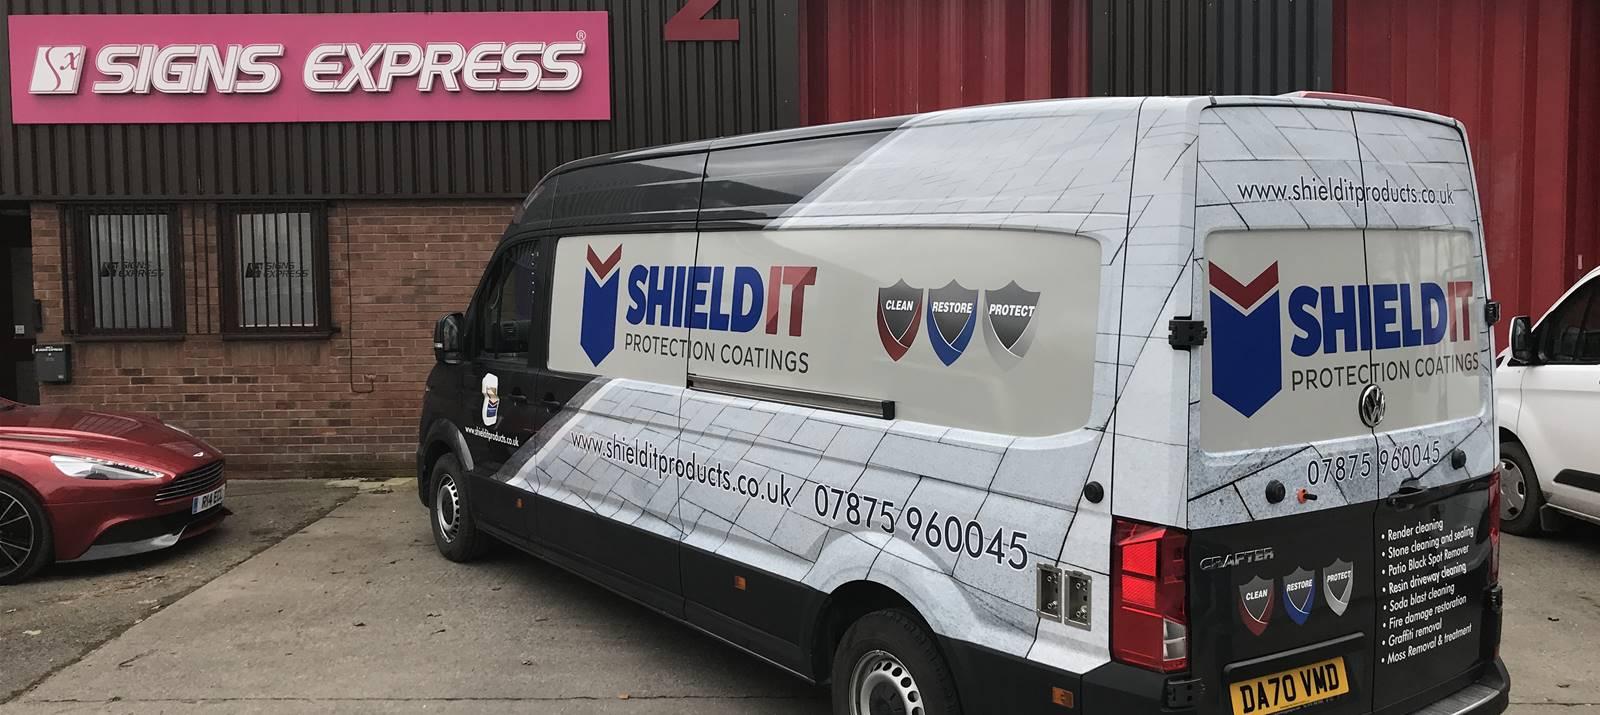 Pro Shield Cheshire, laminated cut vinyl half van wrap